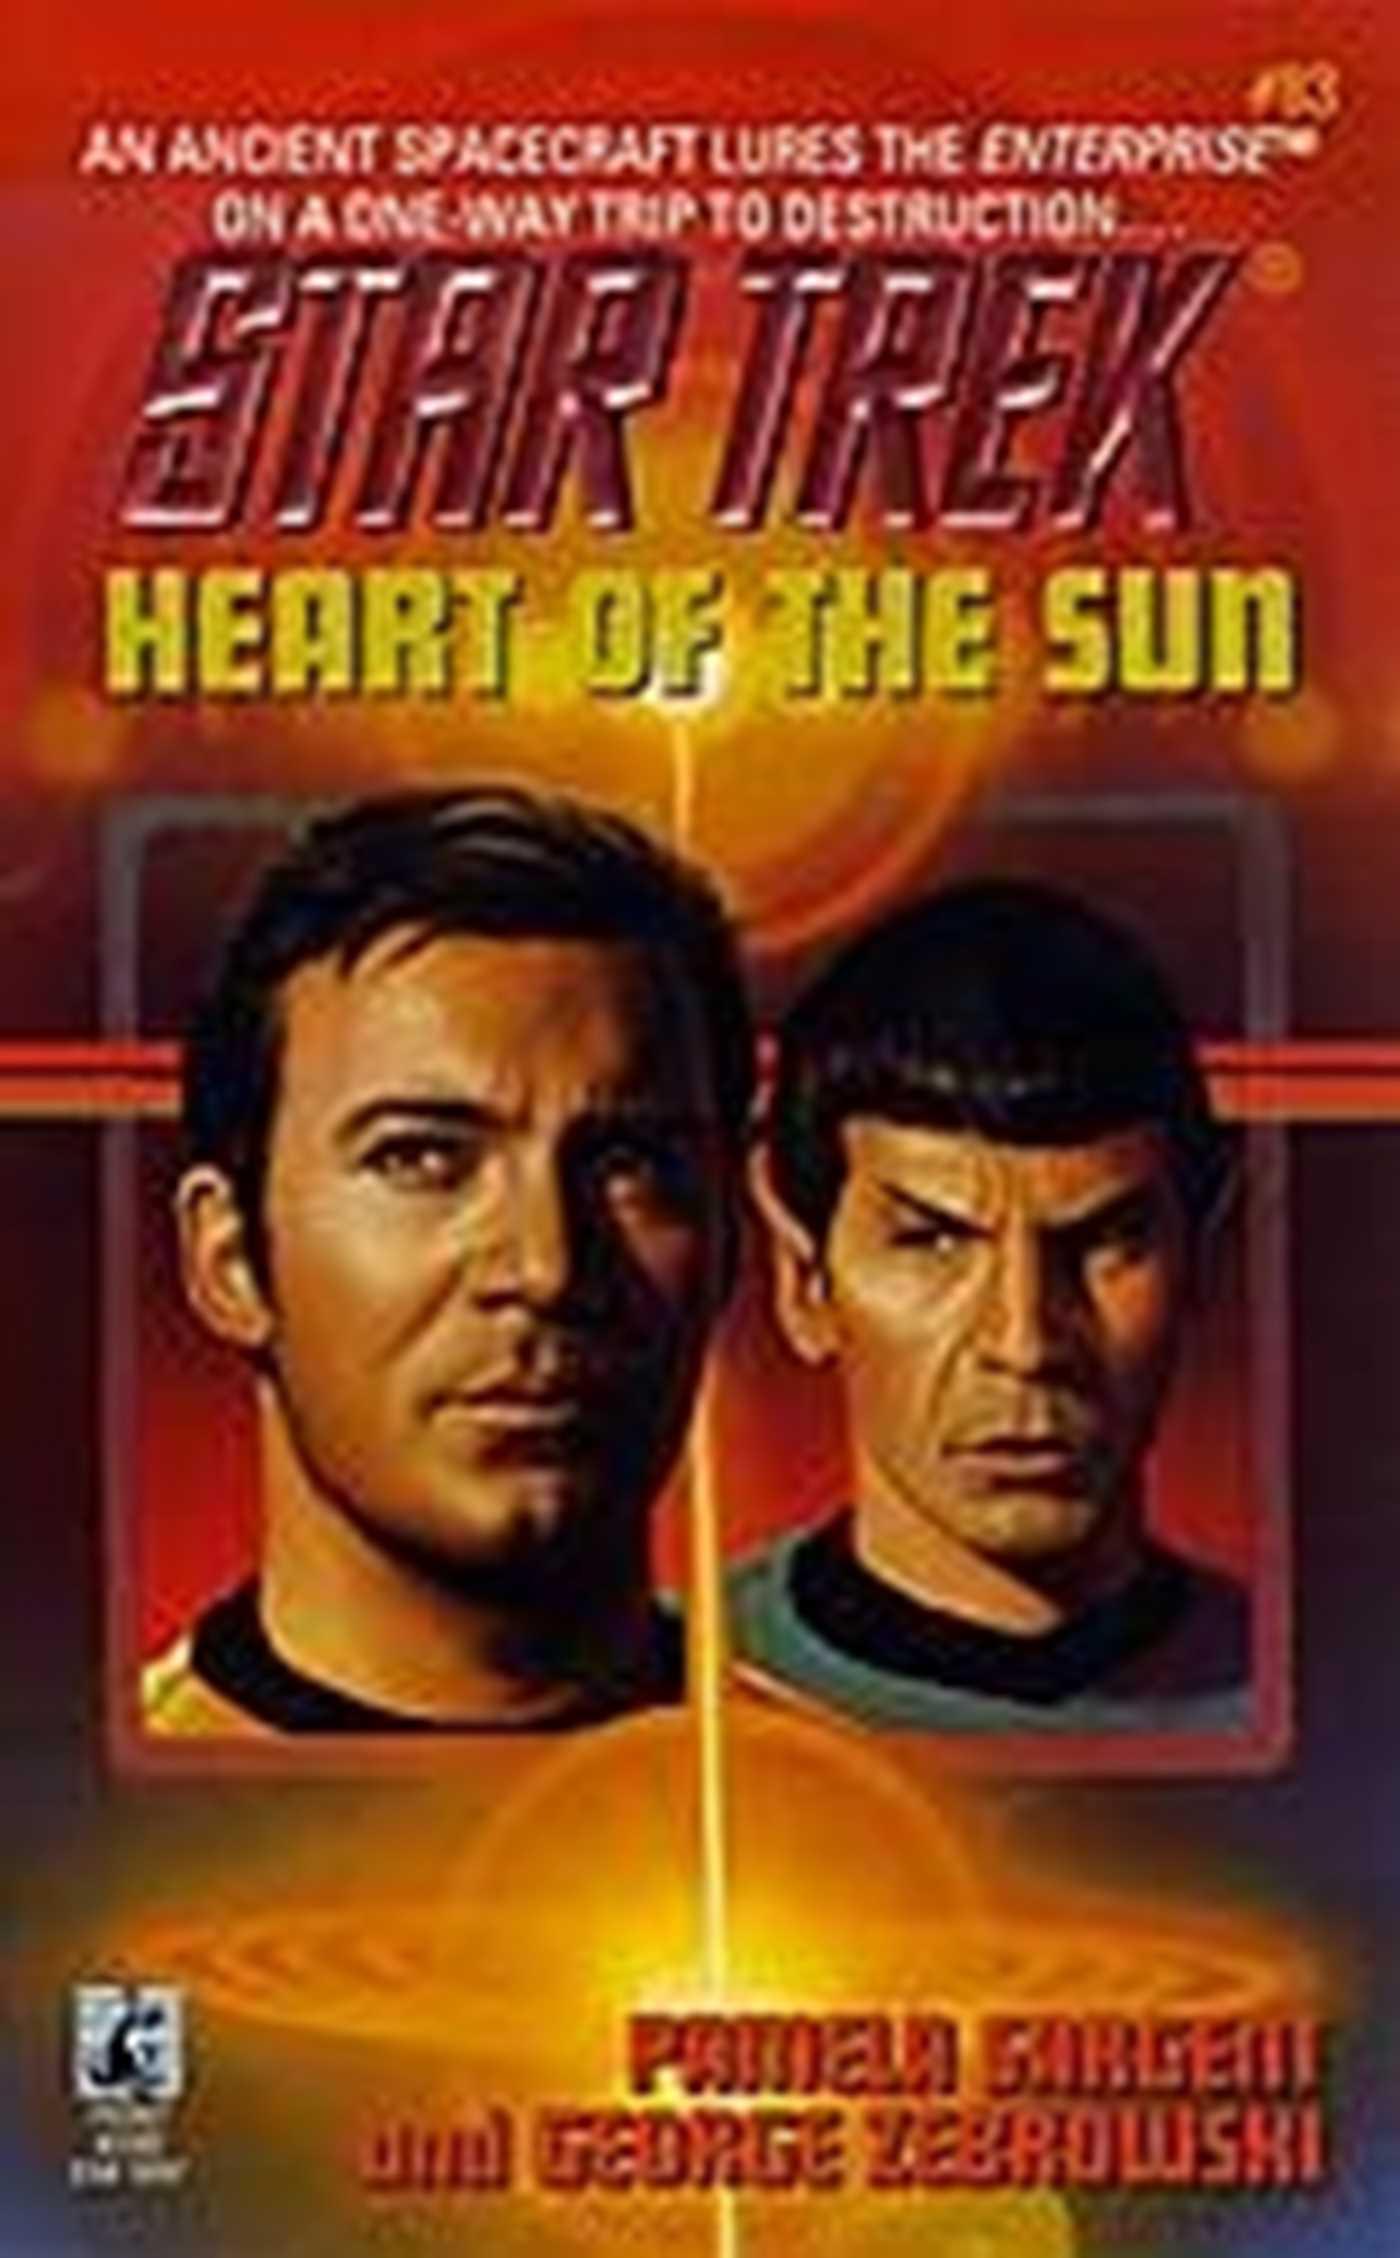 Heart of the sun star trek 83 9780743454001 hr